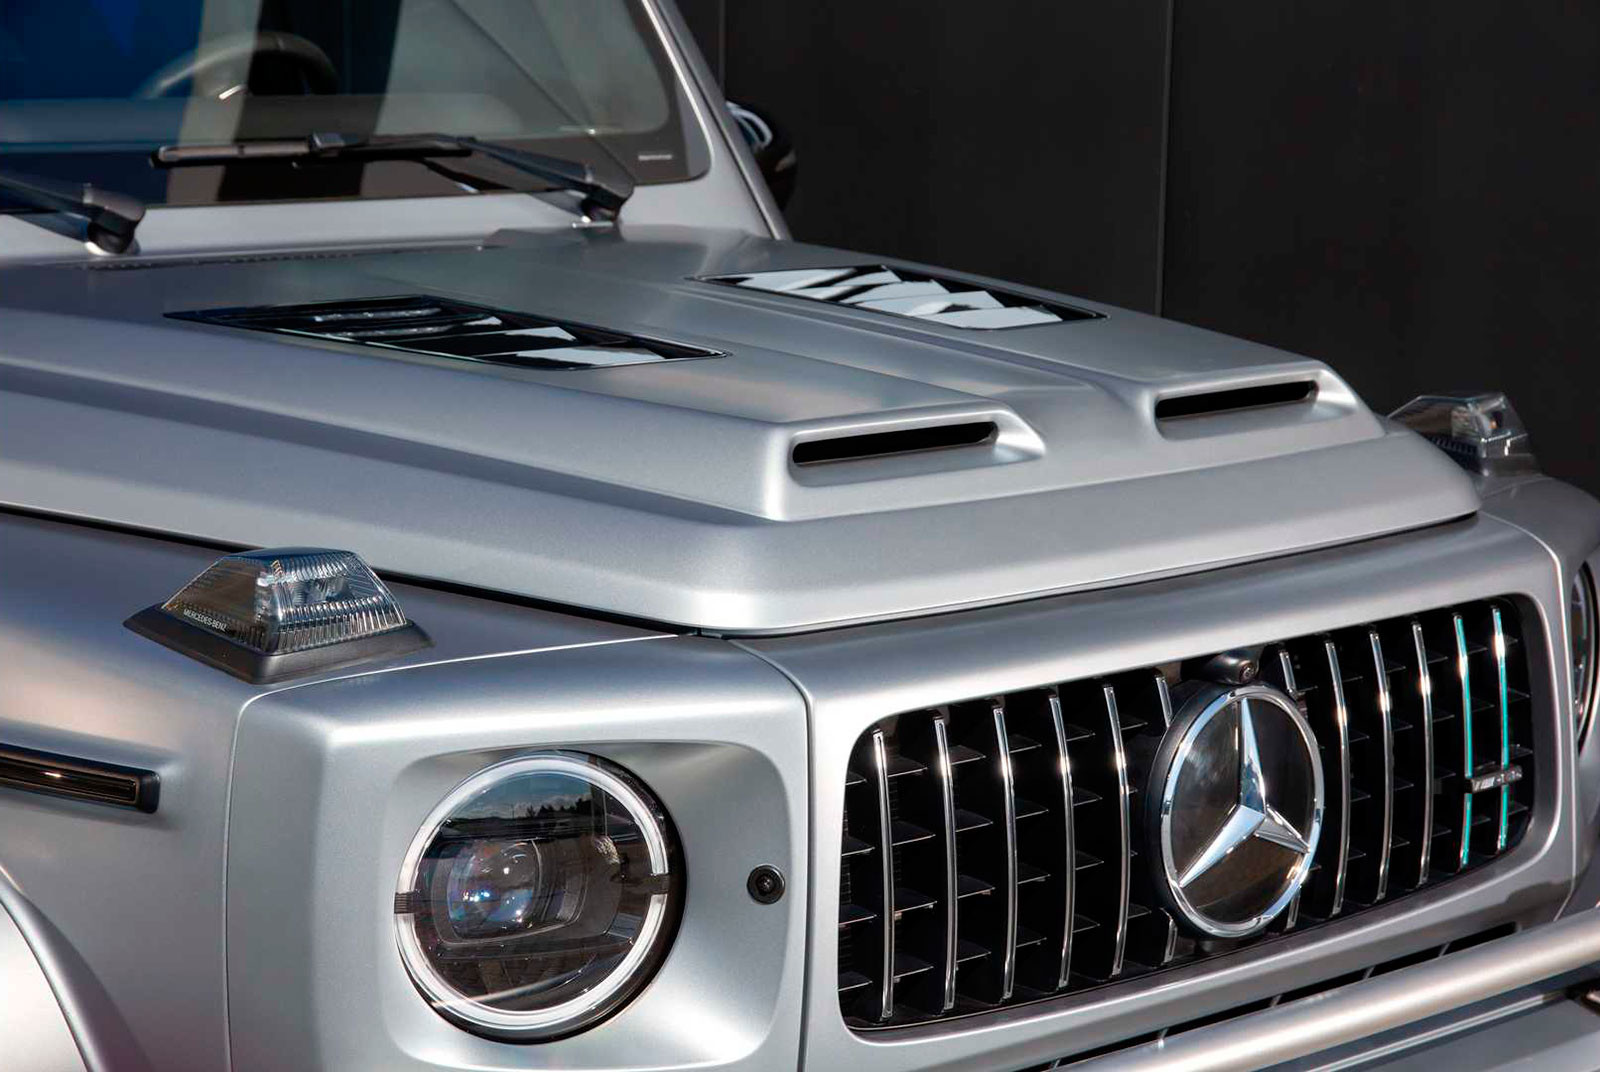 Mercedes-AMG G 63 Posaidon